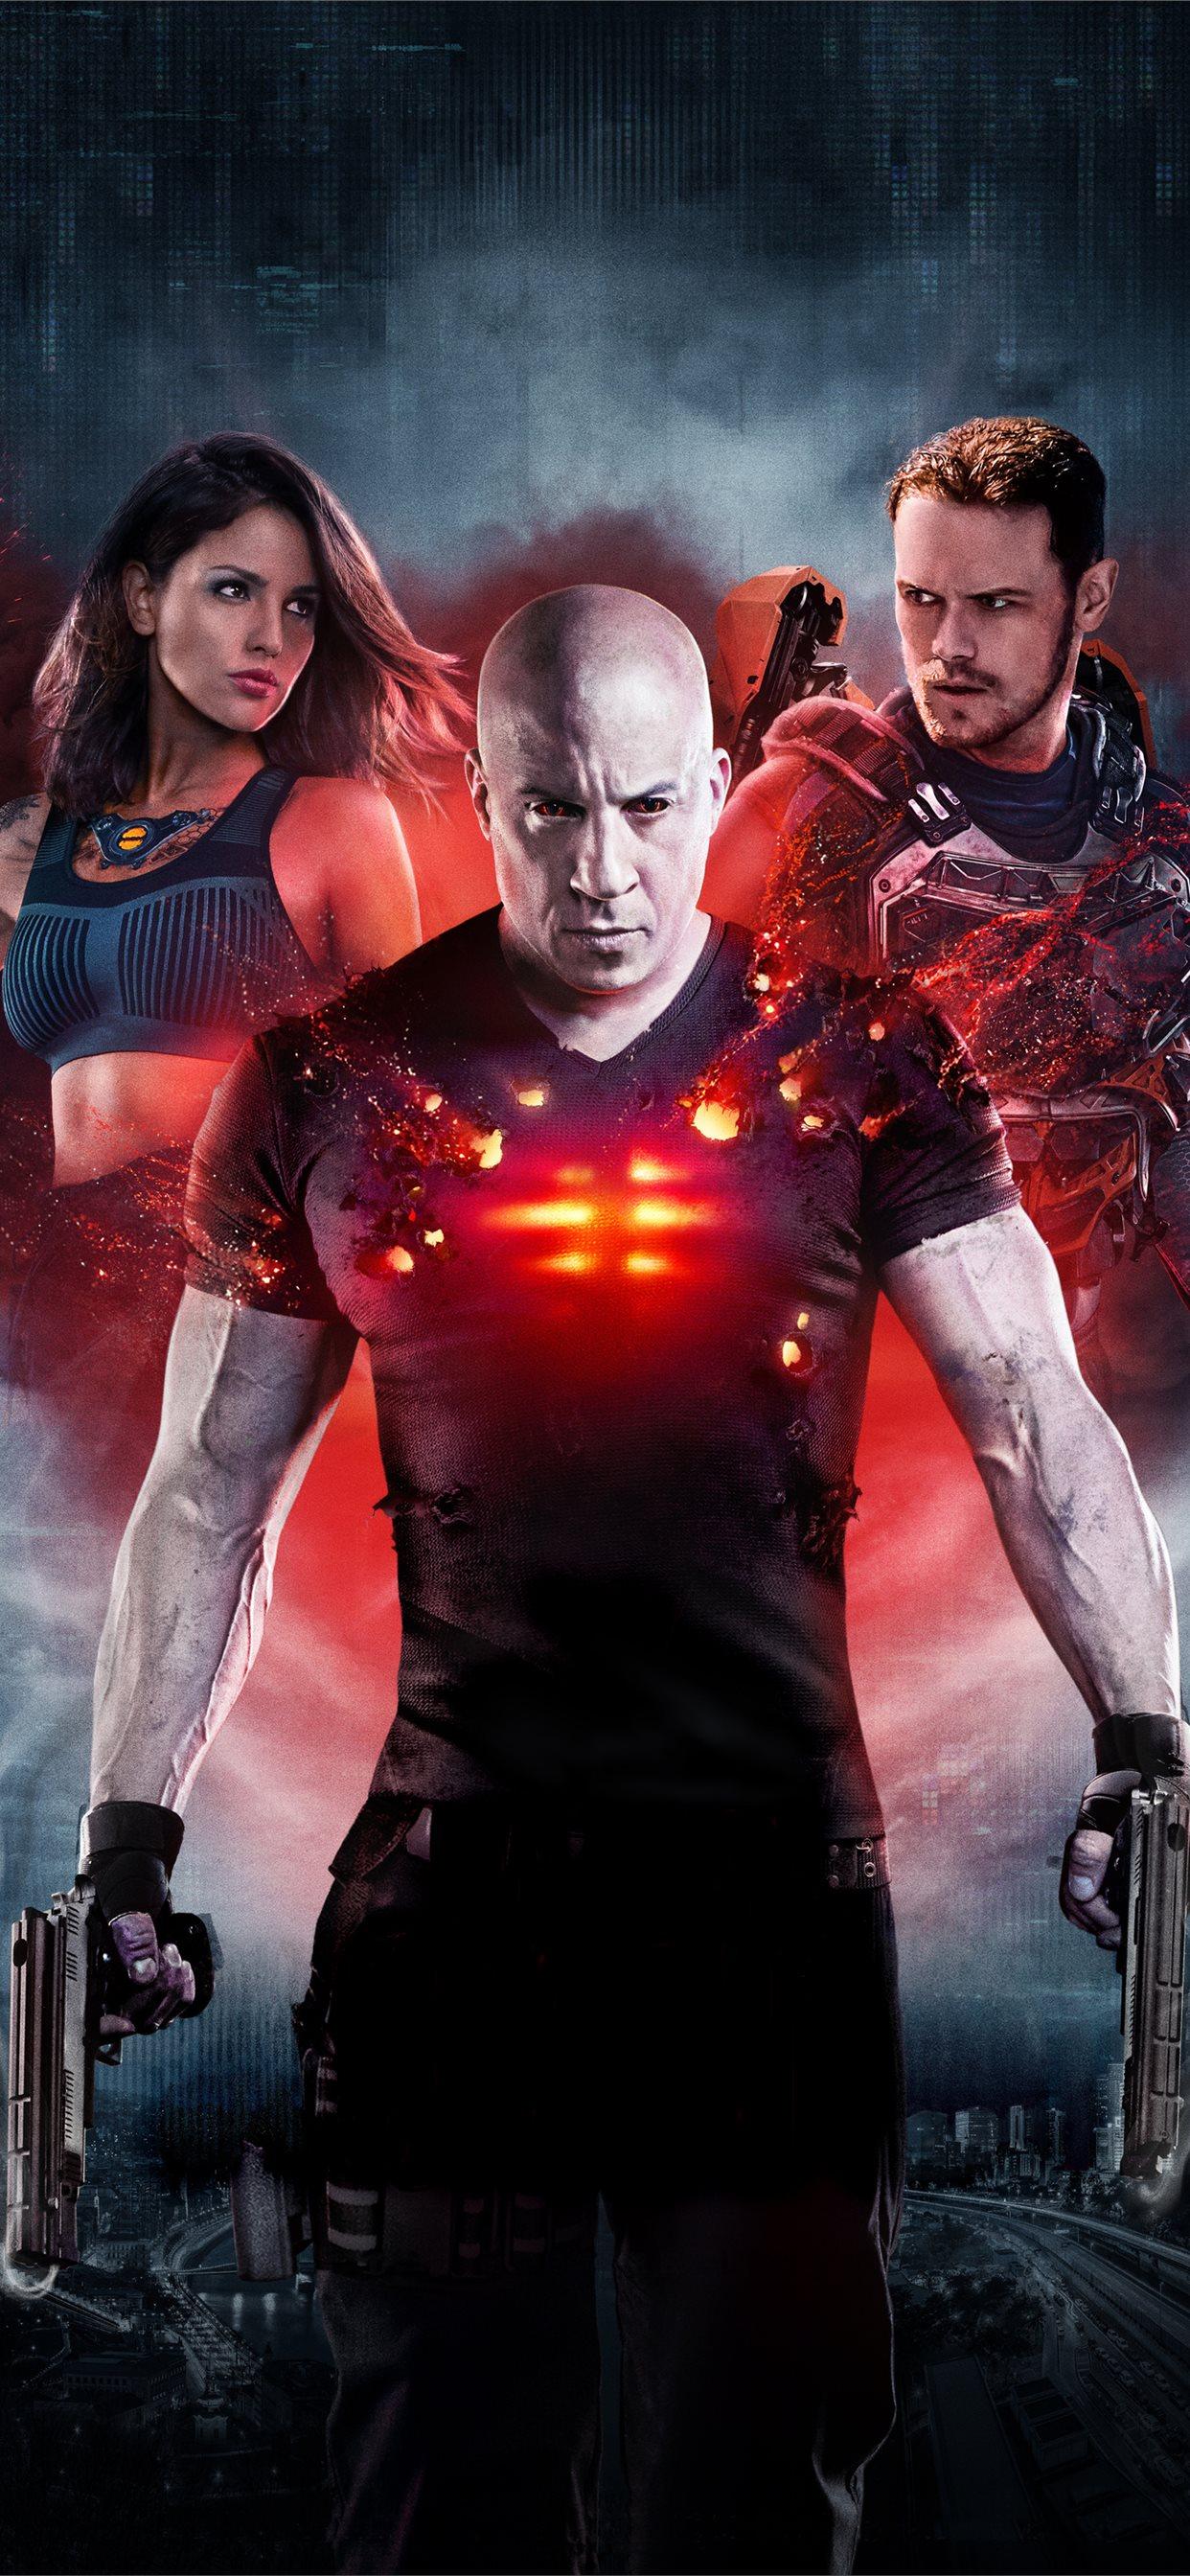 bloodshot movie 5k 2020 iPhone Wallpapers Download 1242x2688